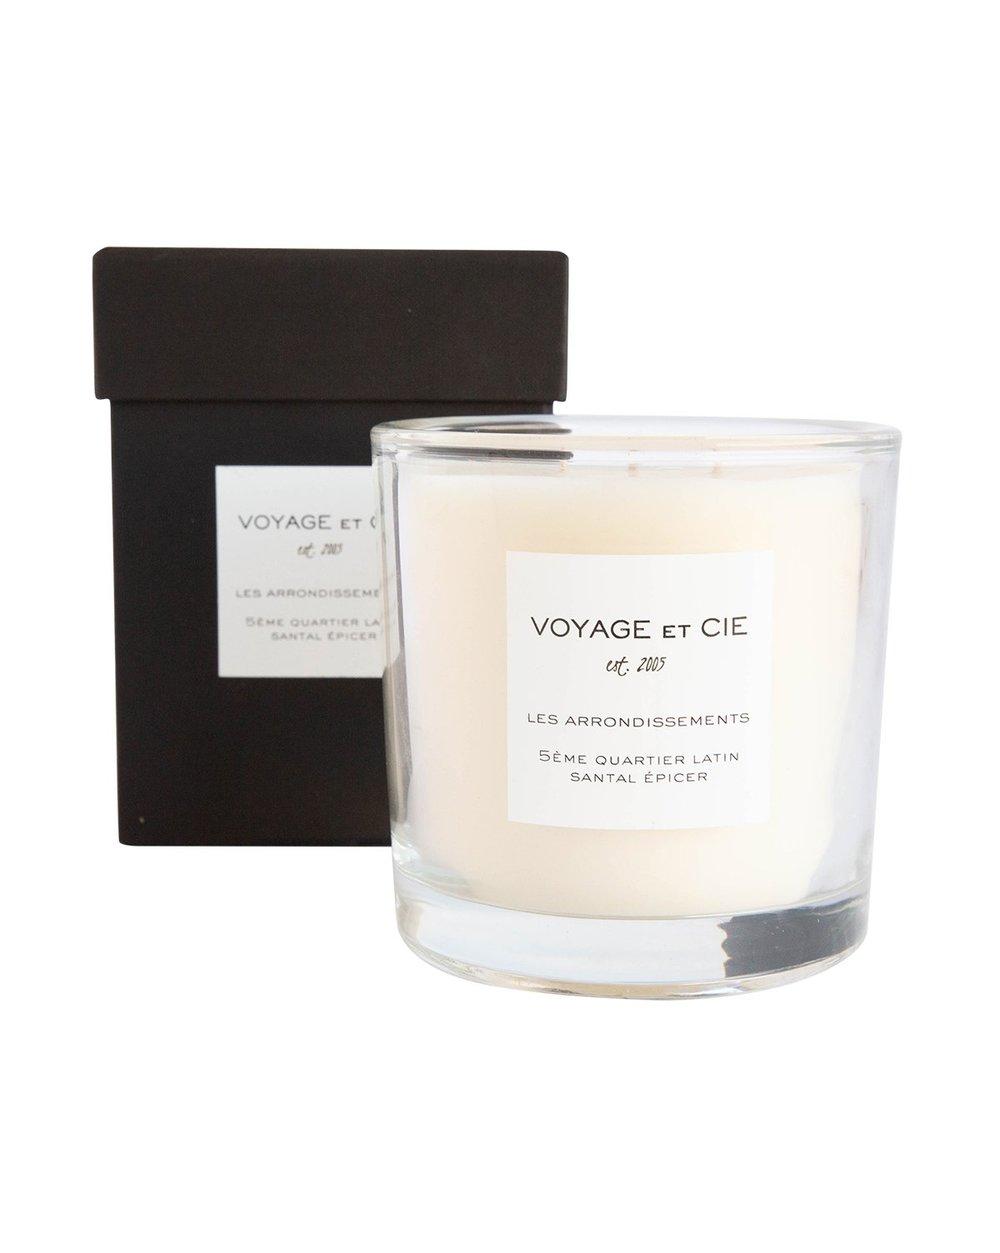 Voyage_et_Cie_3-Wick_Candle_4.jpg